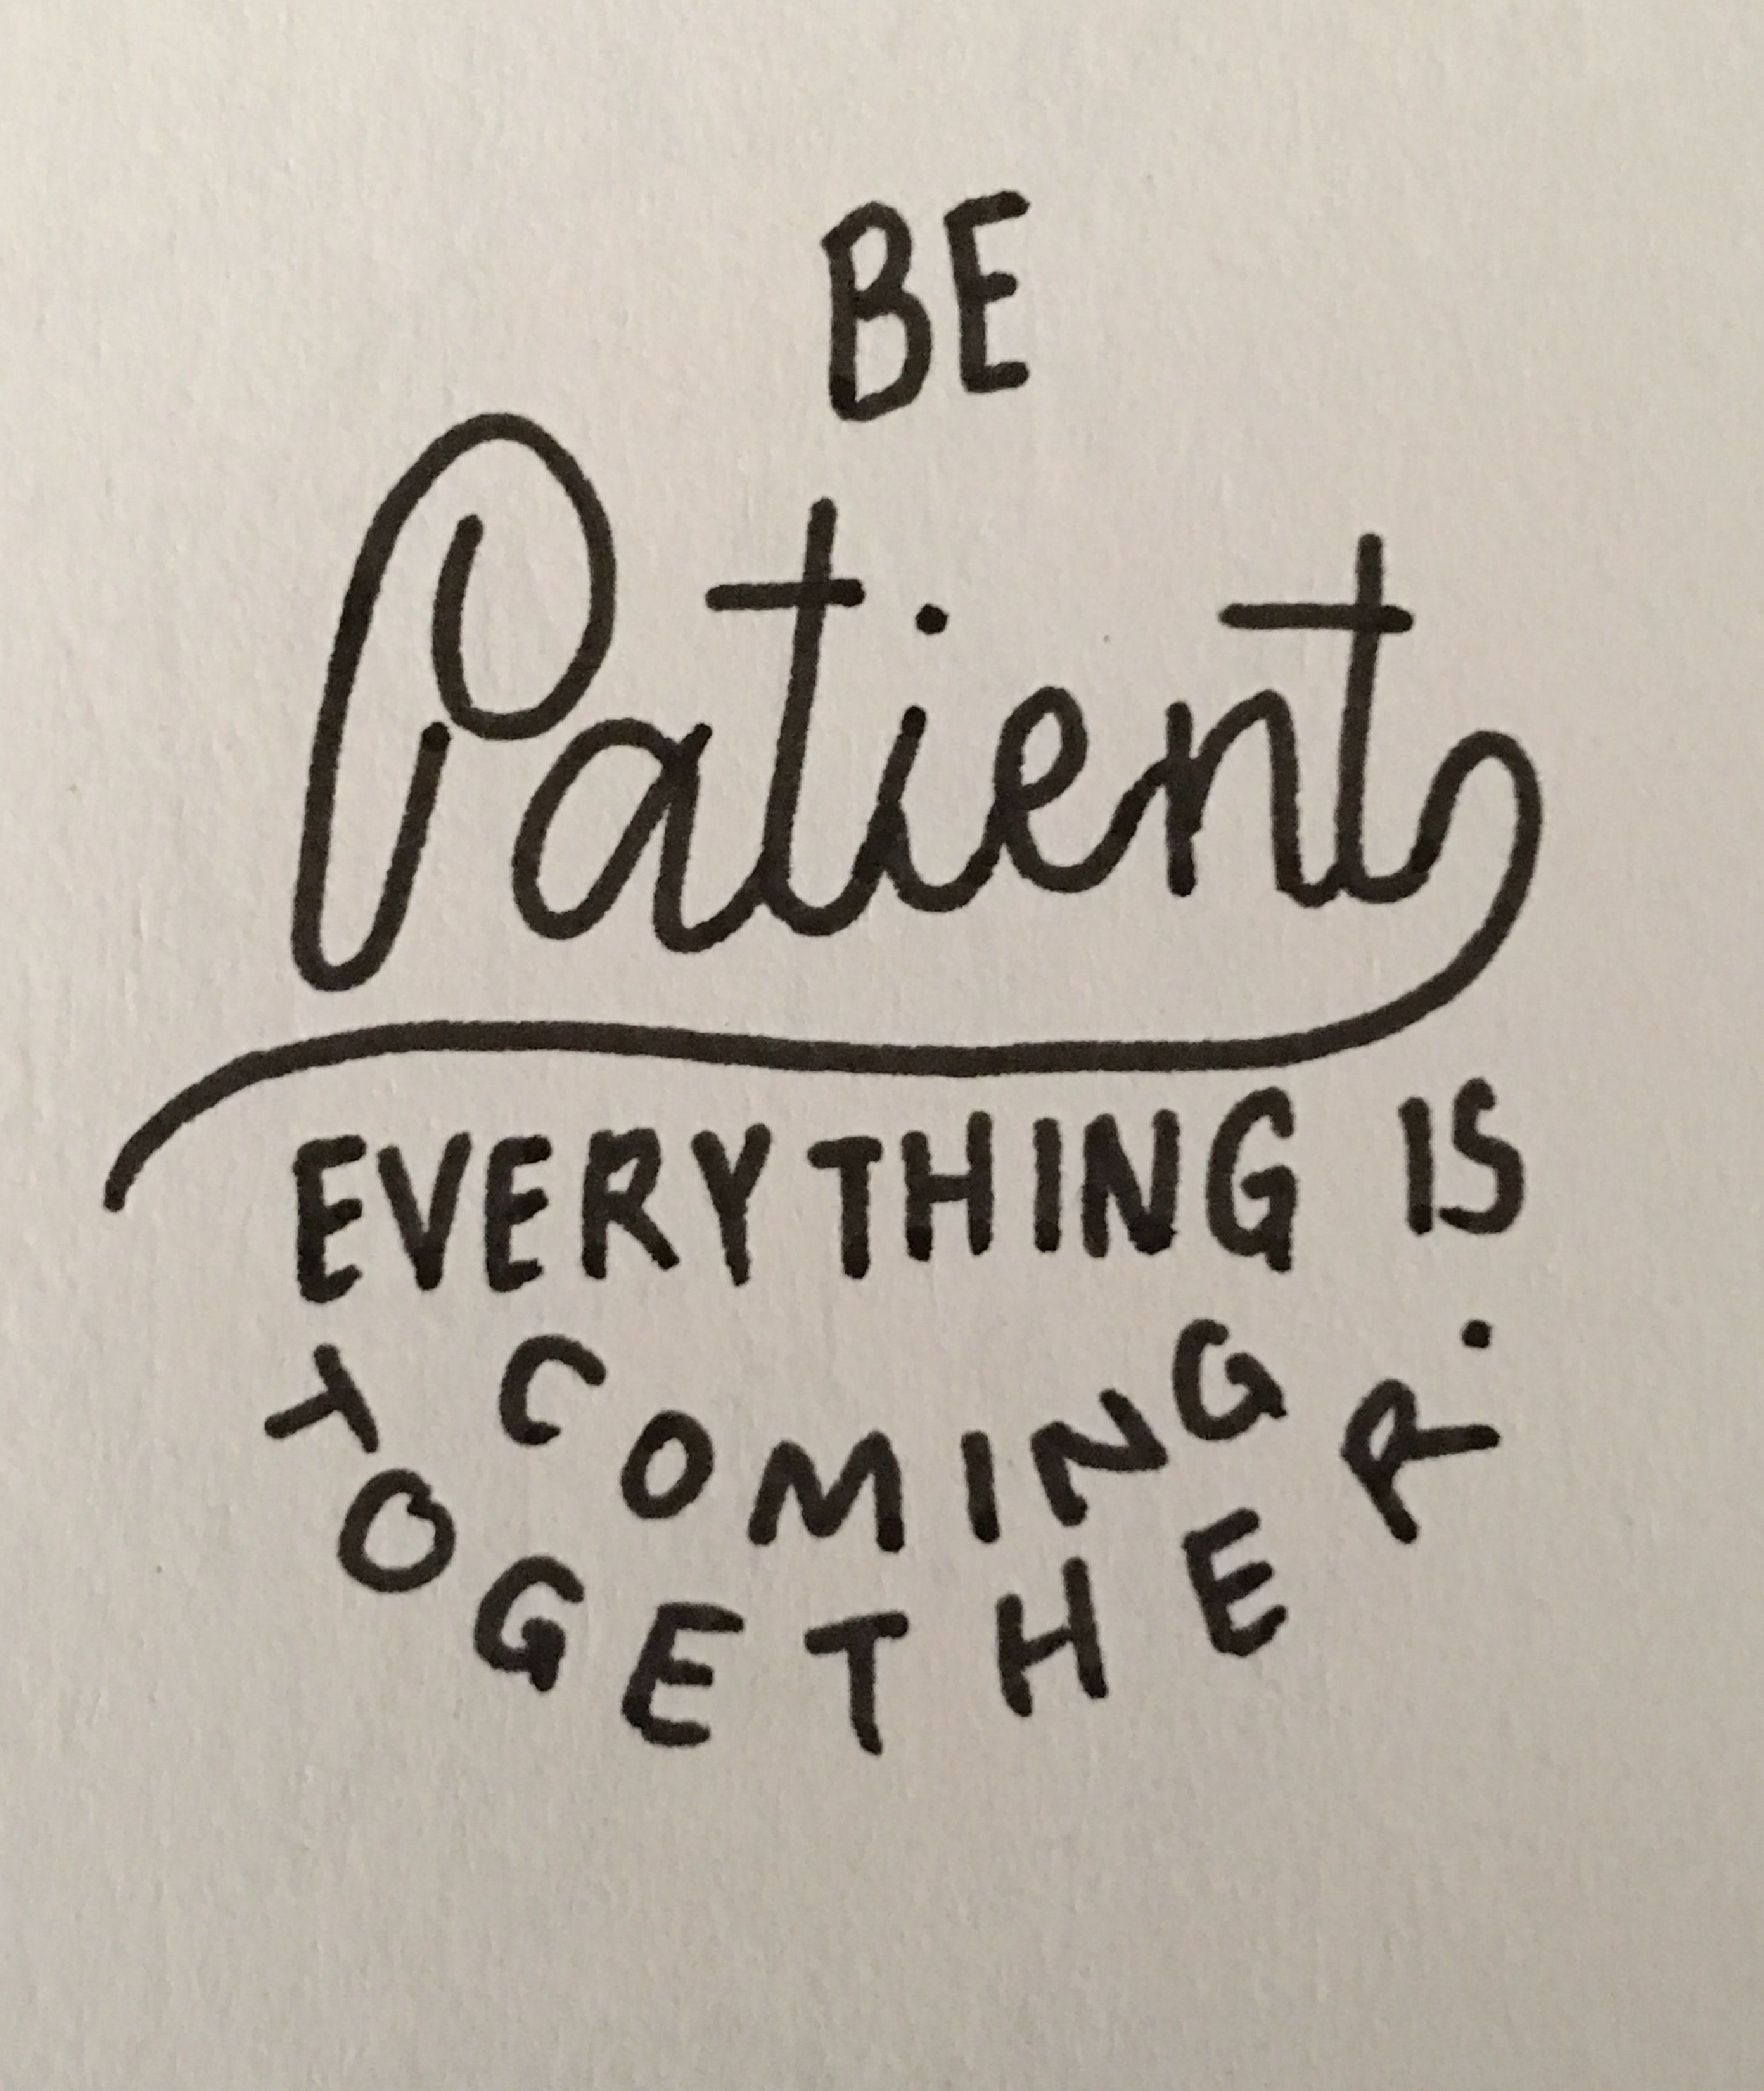 Patience quote Patience quotes, Quotes, Patience